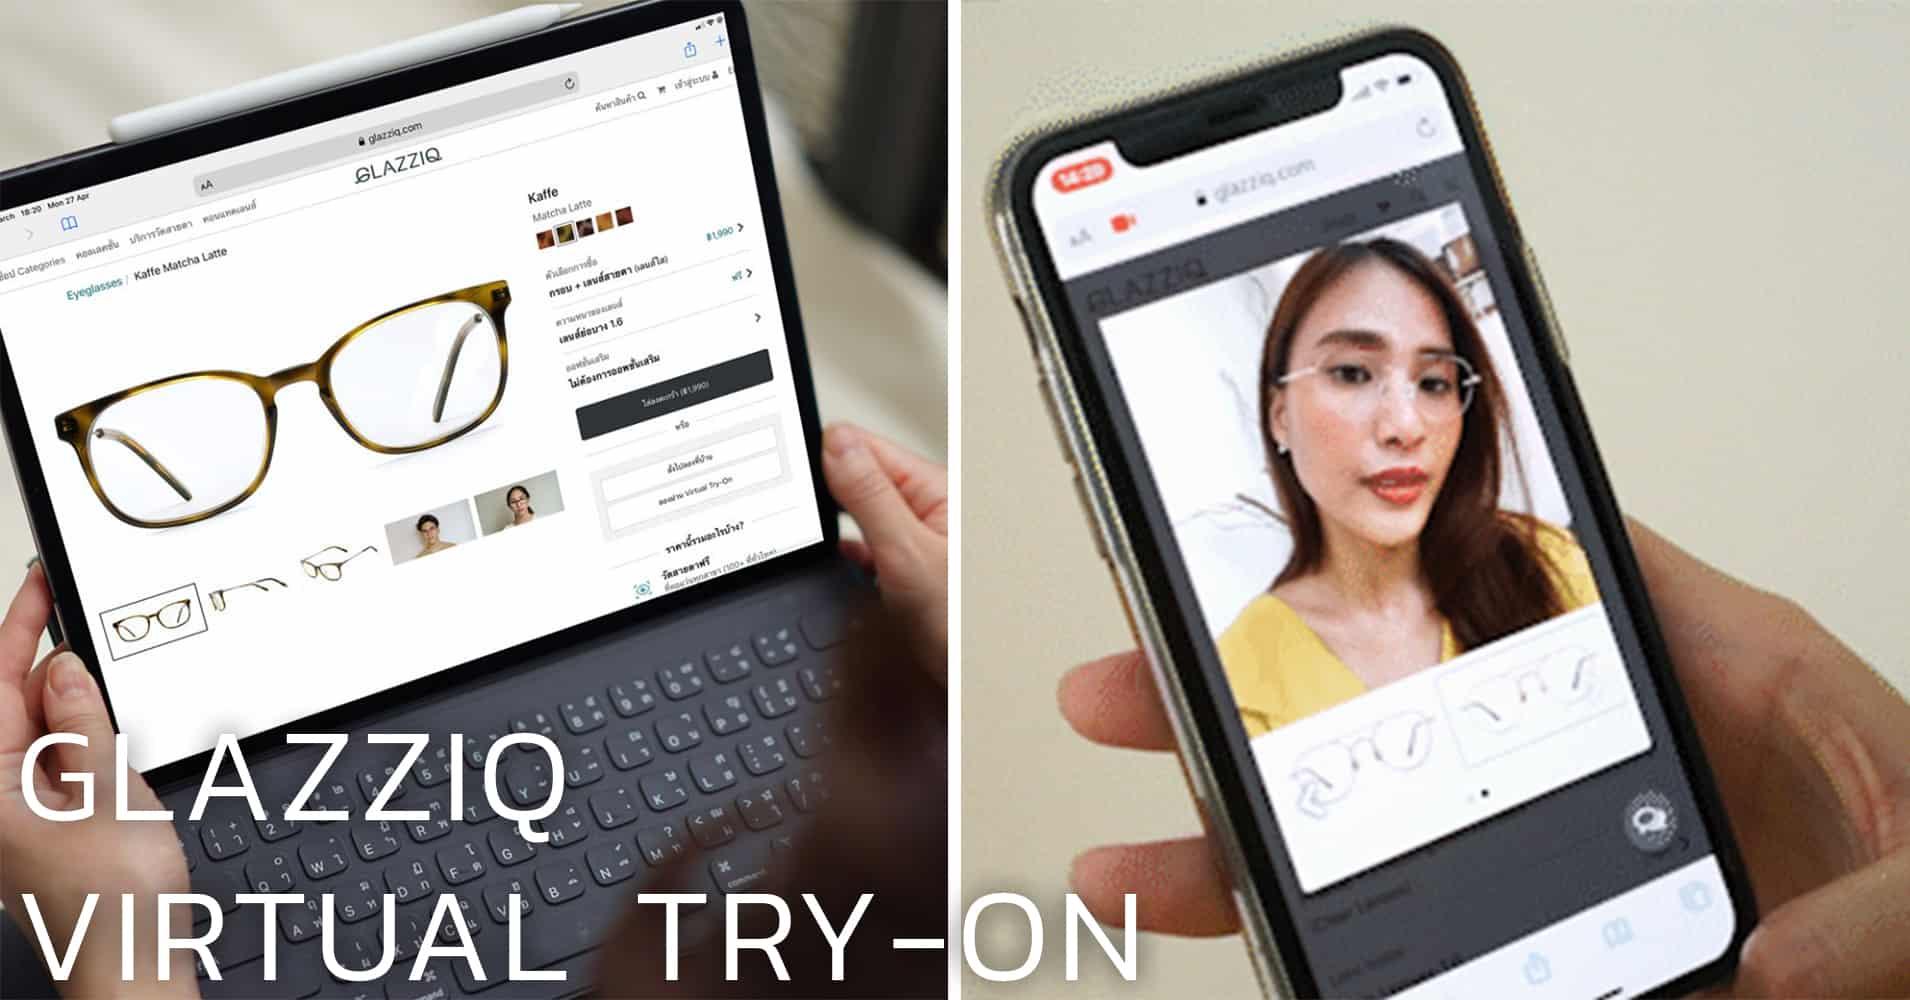 GLAZZIQ กับฟีเจอร์ Virtual Try-On ที่ทำให้การตัดแว่นออนไลน์เป็นเรื่องง่าย